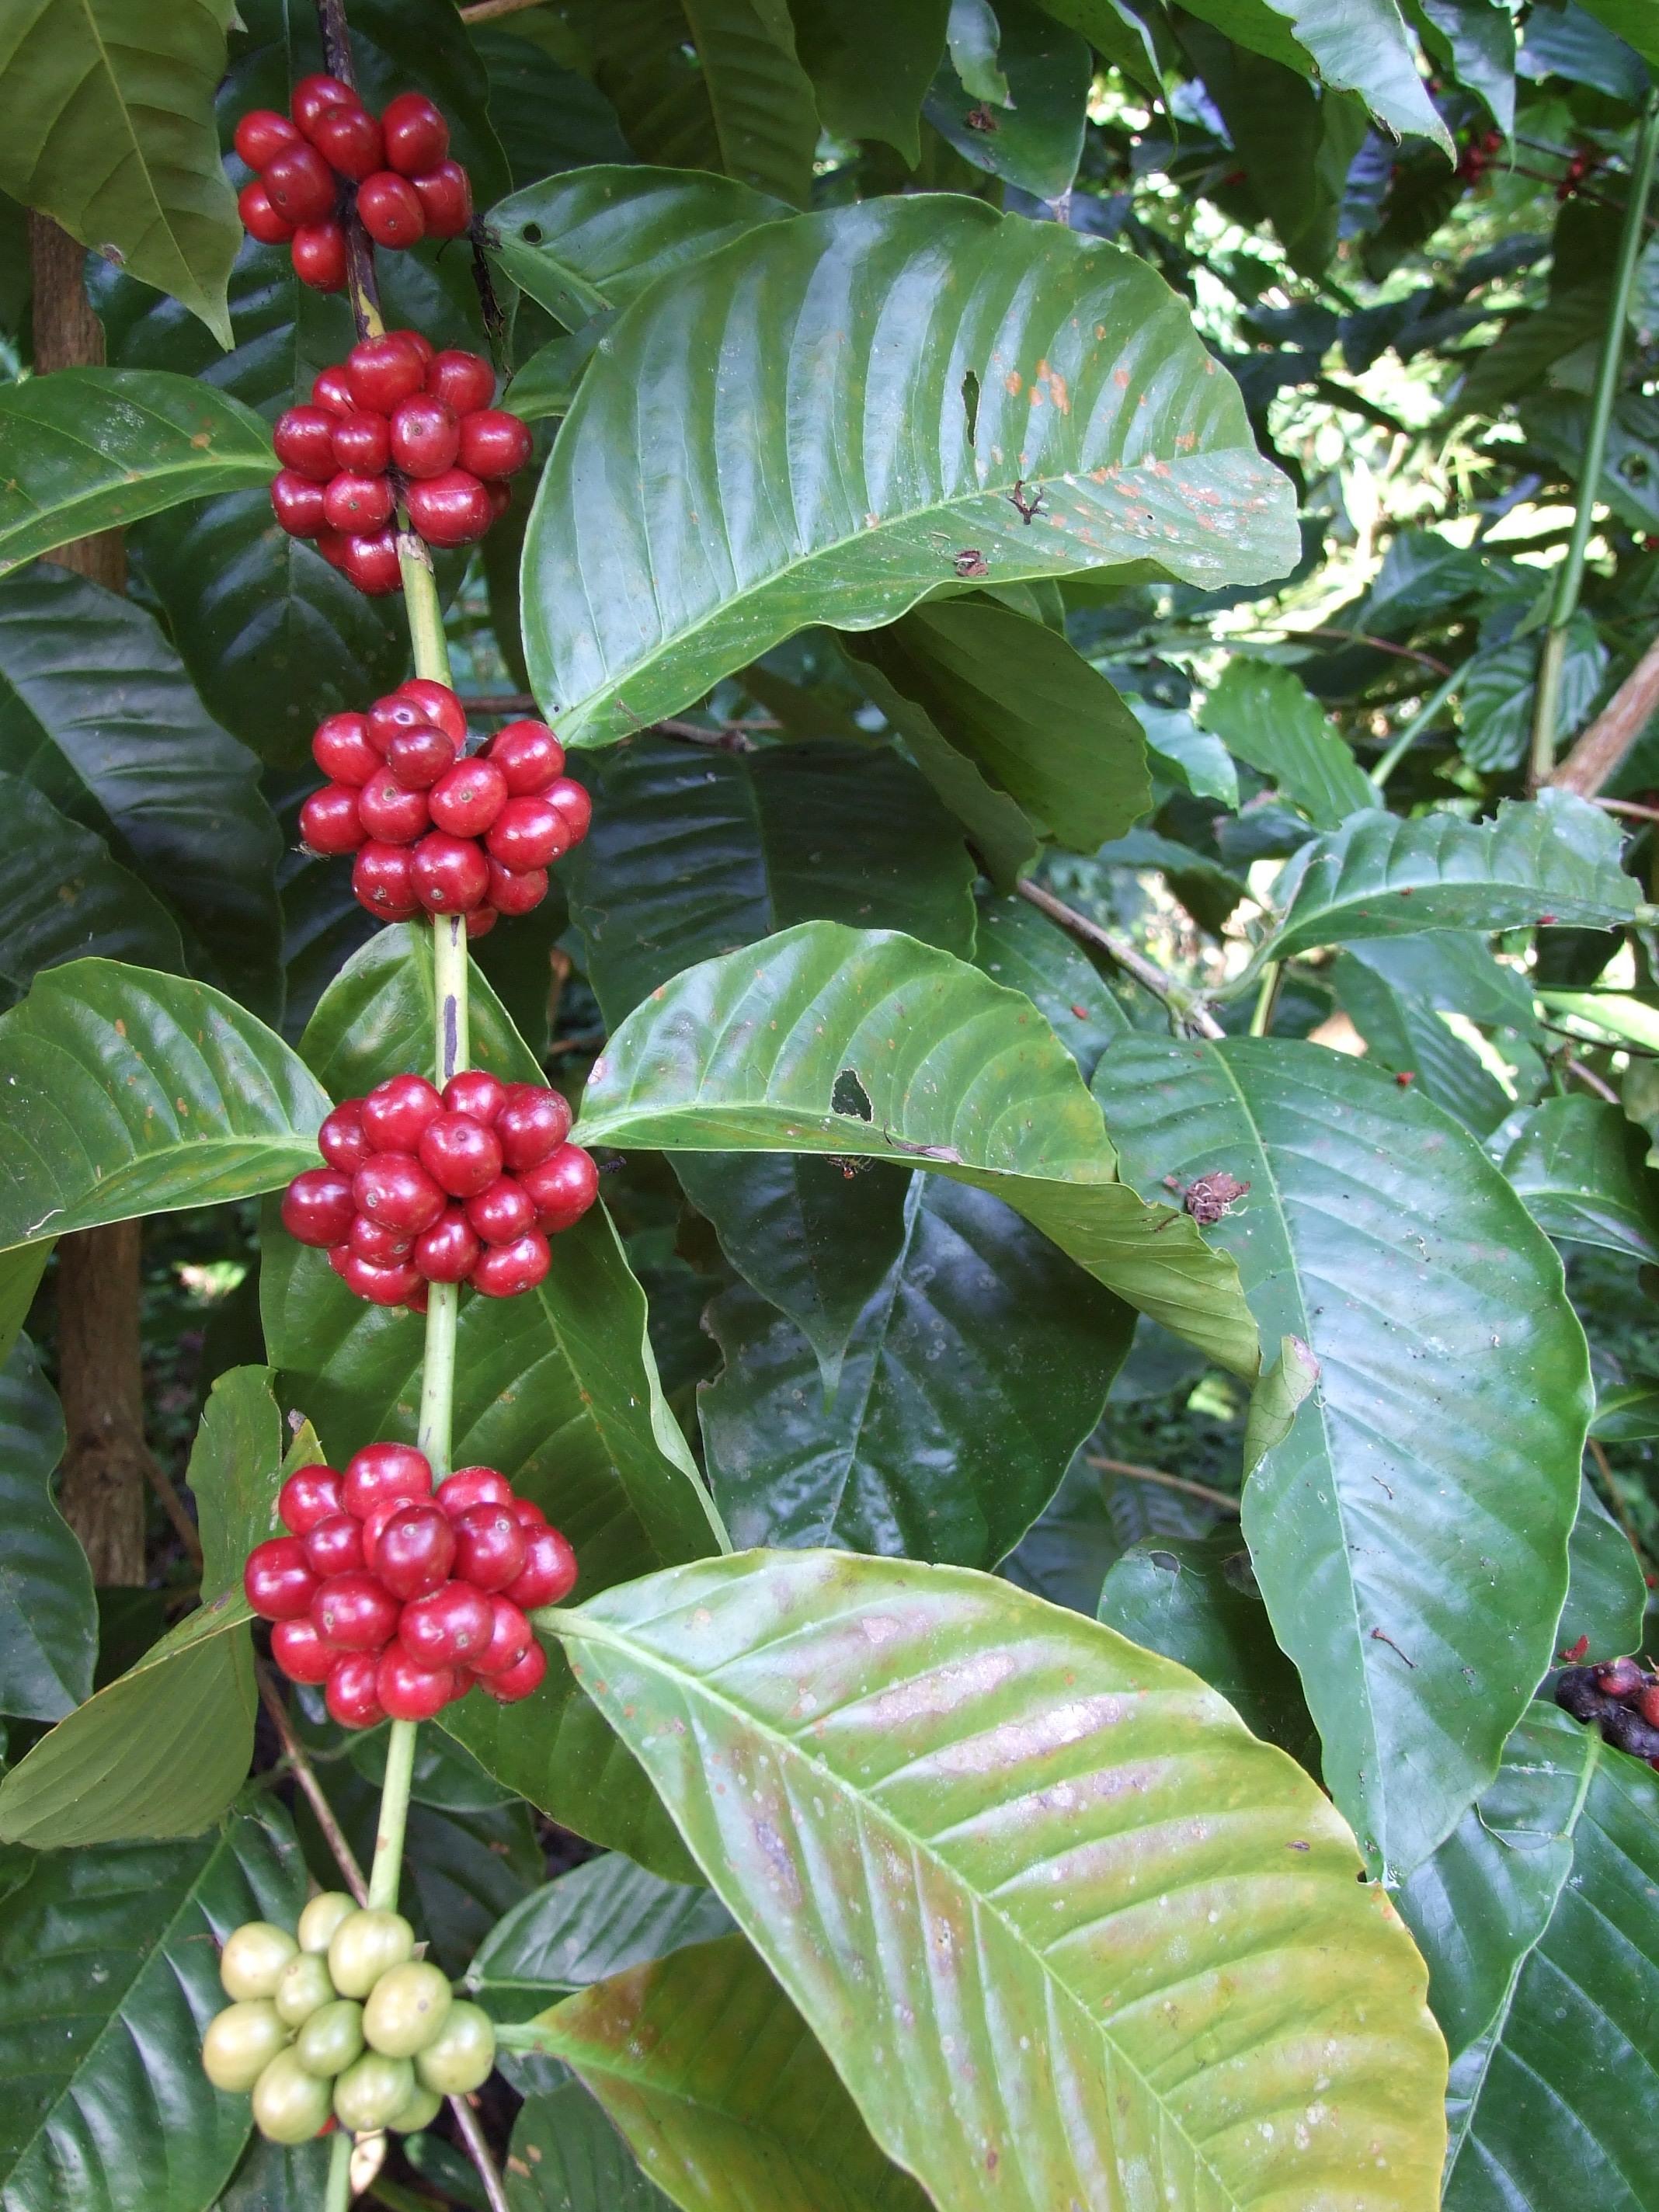 Coffea conifera fruit and leaf.